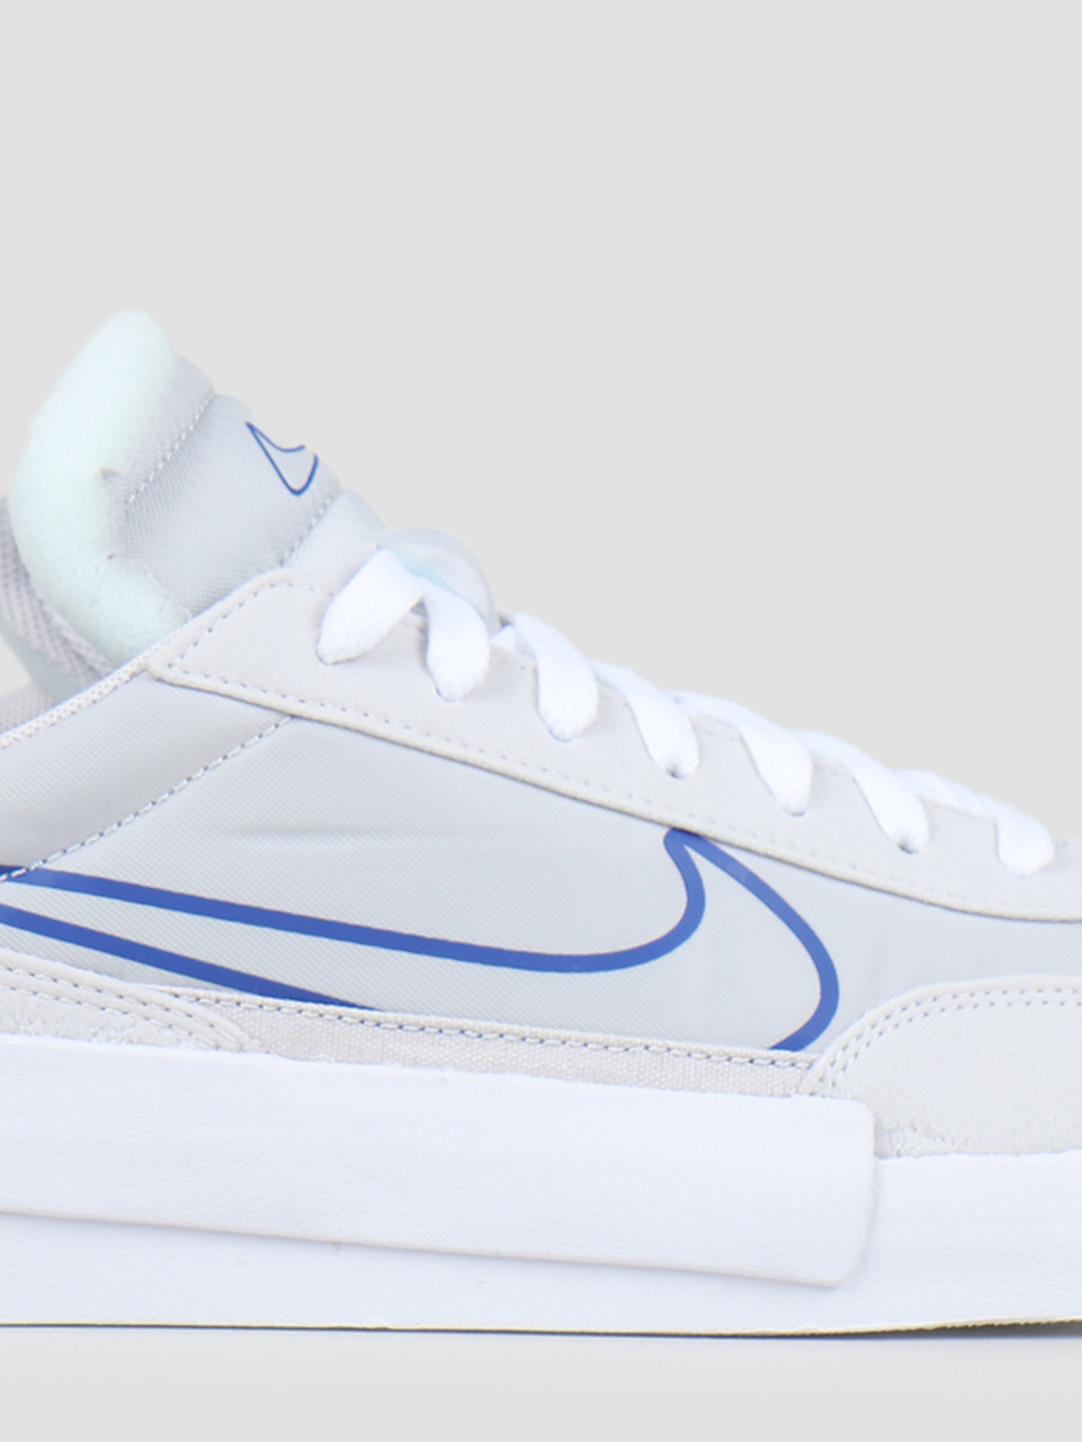 Nike Nike Drop Type Hbr Vast Grey Hyper Blue Black White CQ0989-001